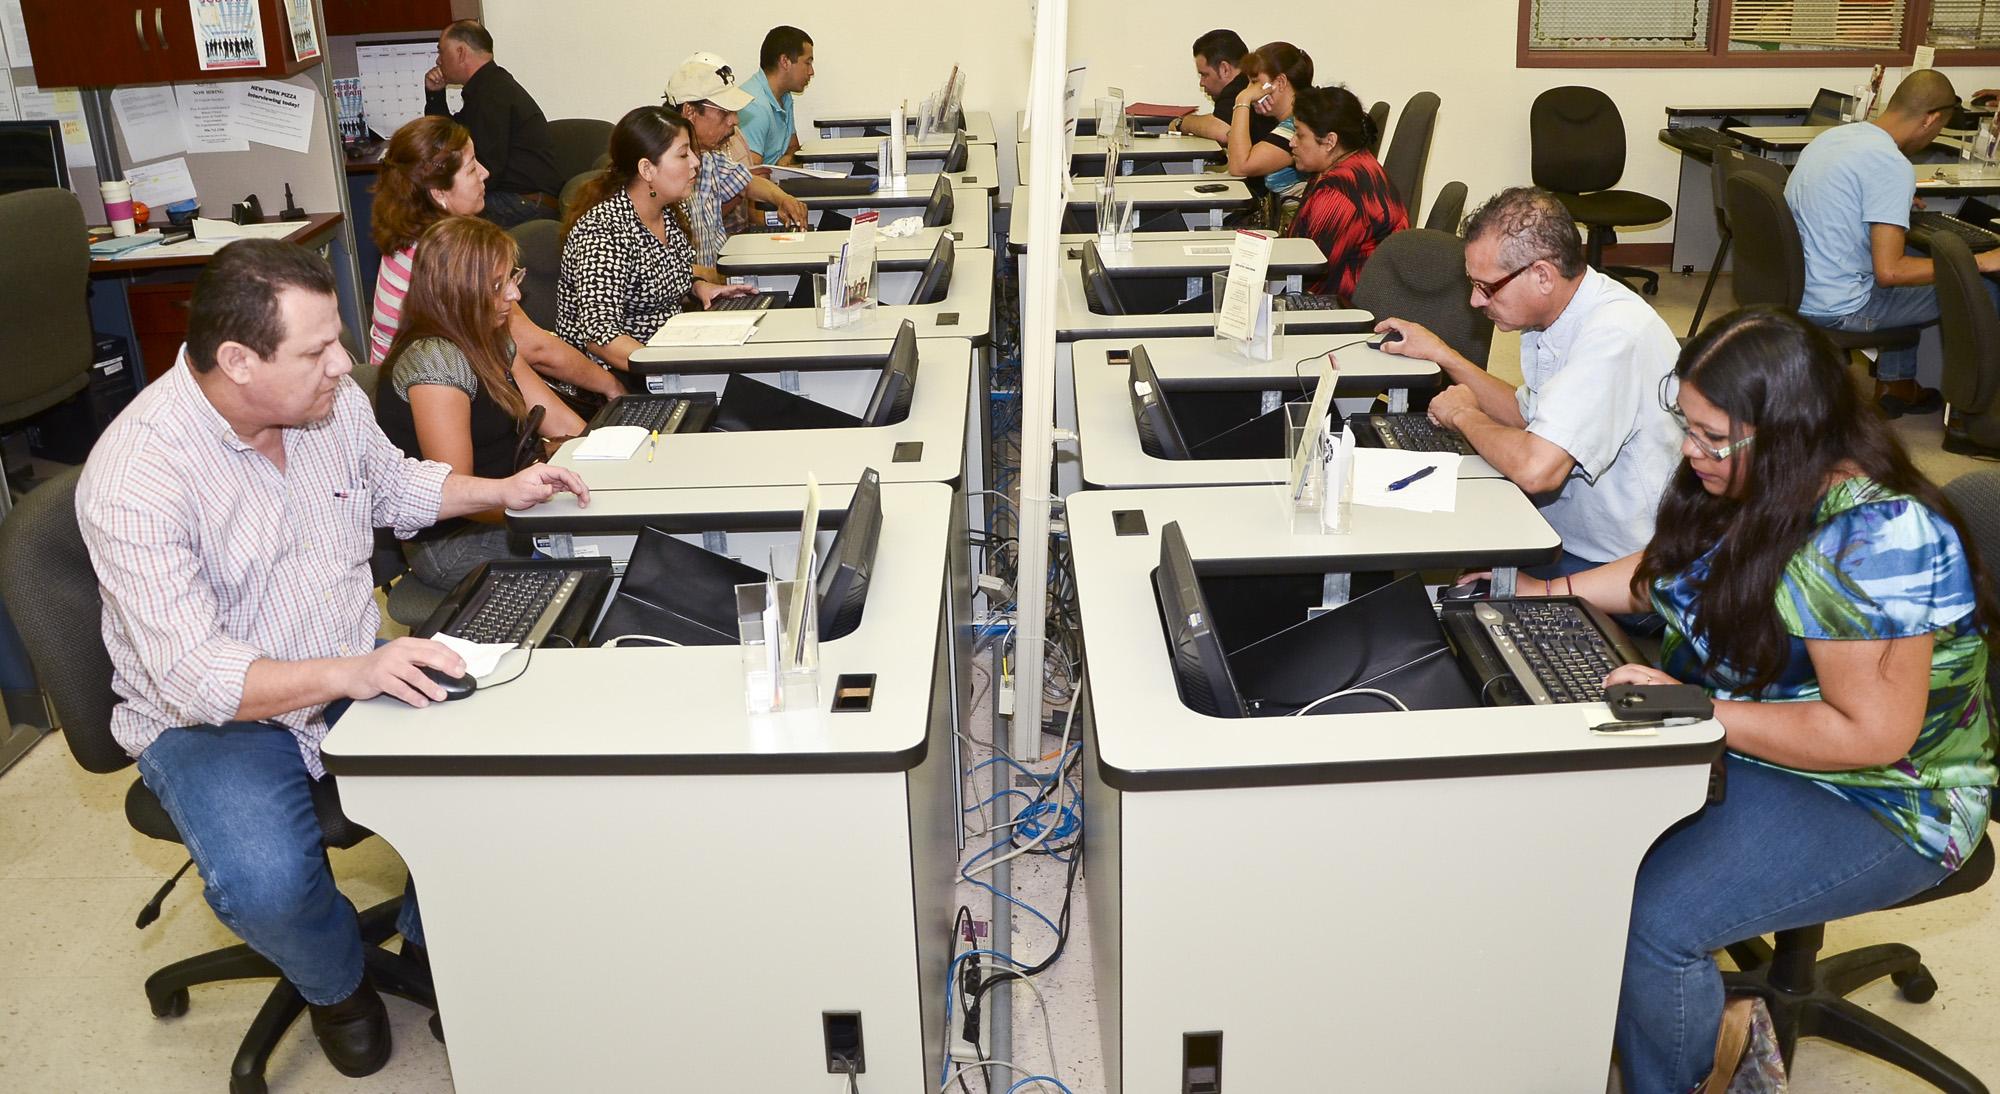 texas job growth stagnates in adds just 200 jobs across state texas job growth stagnates in adds just 200 jobs across state san antonio express news